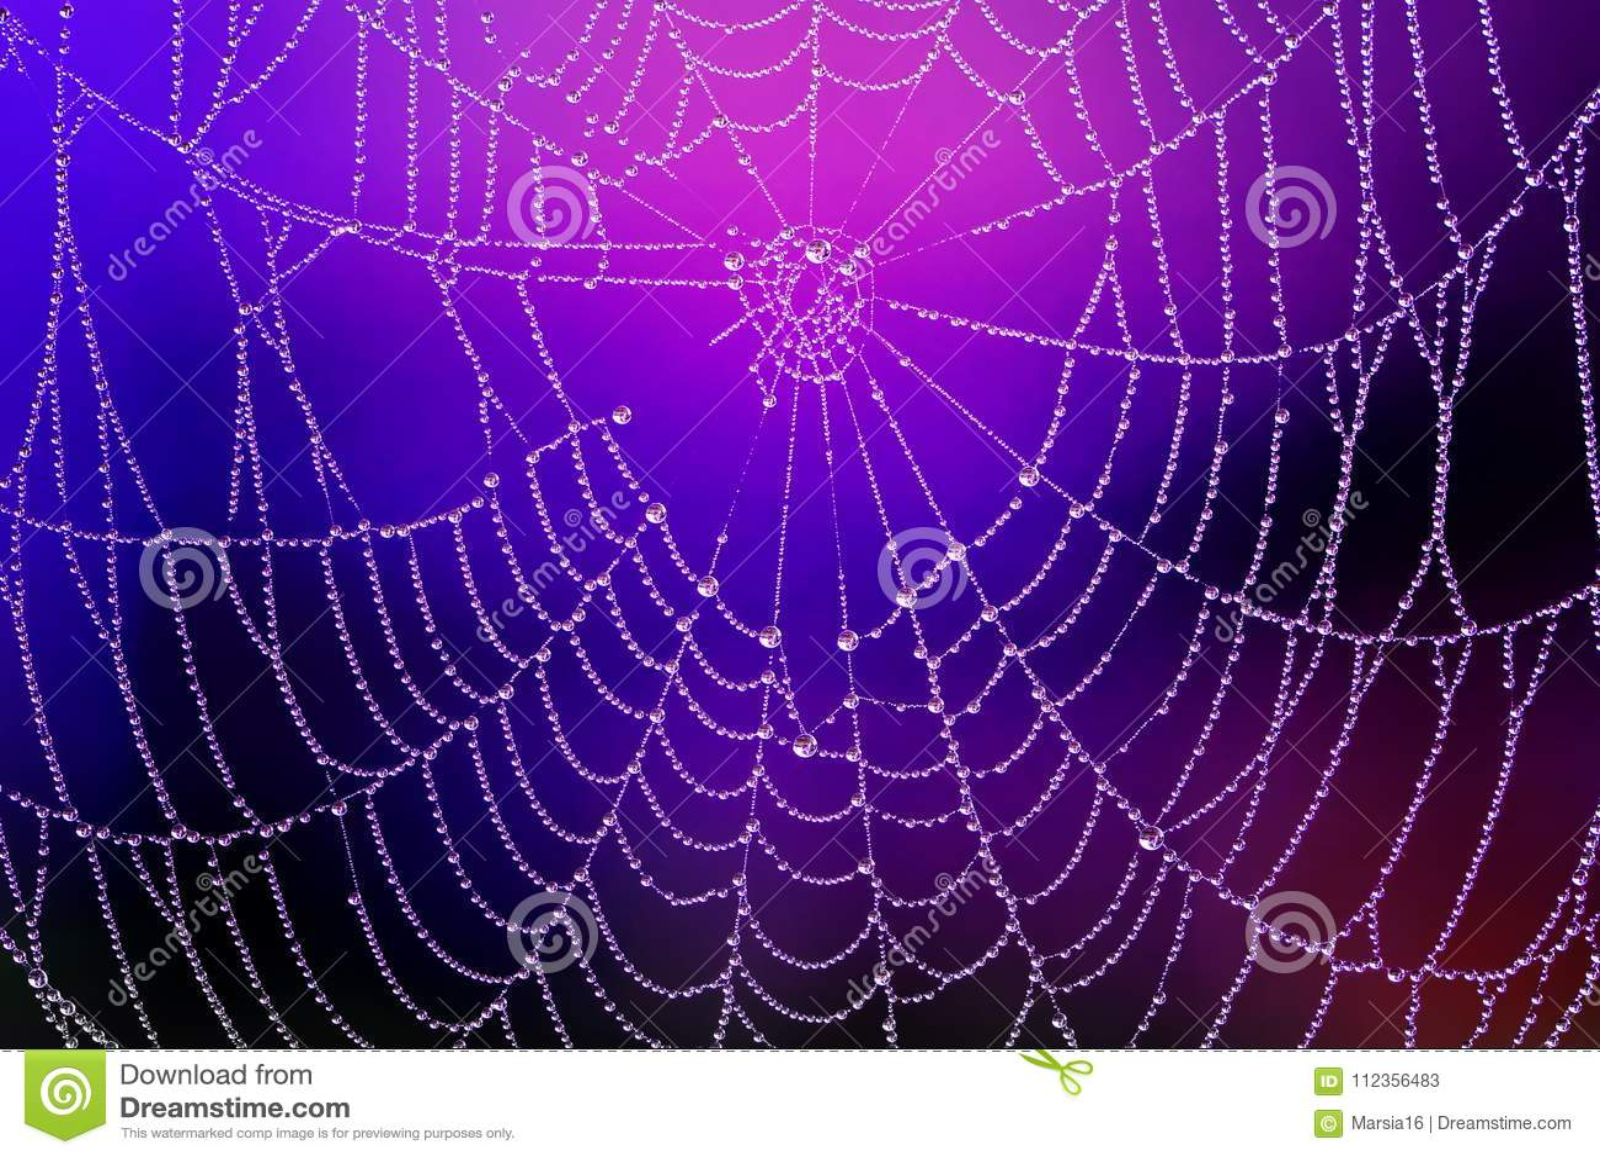 Spiderweb with Dew Drops